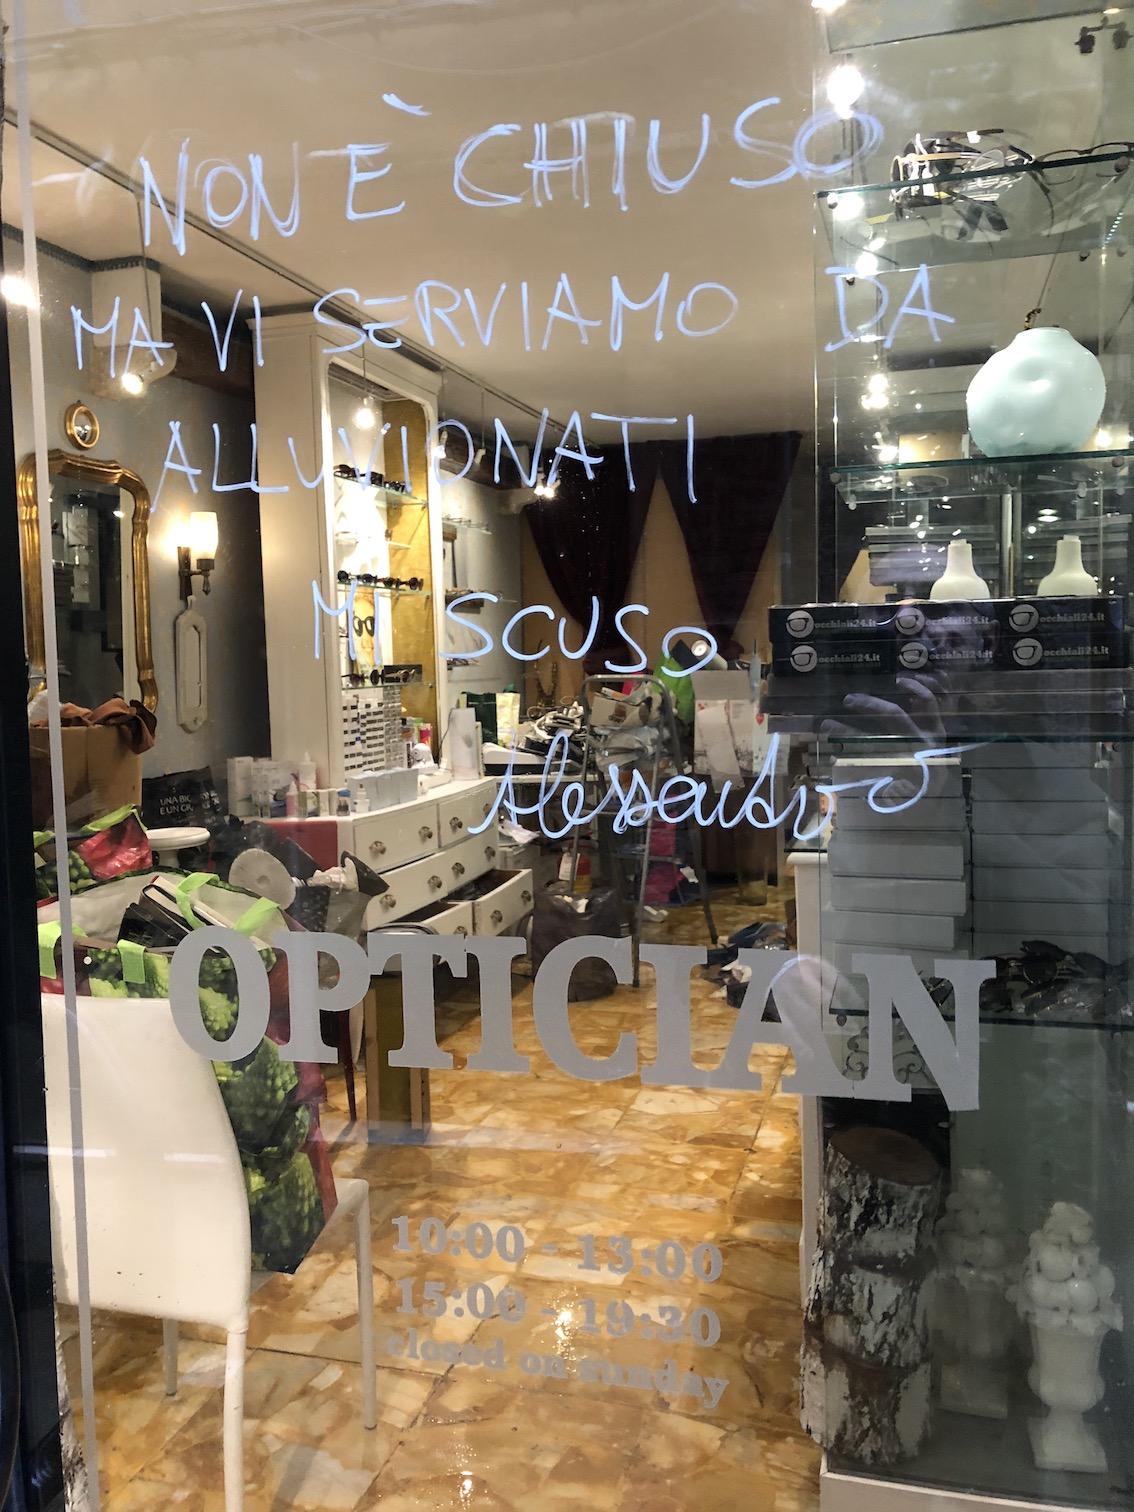 Acqua alta a Venezia - novembre 2019